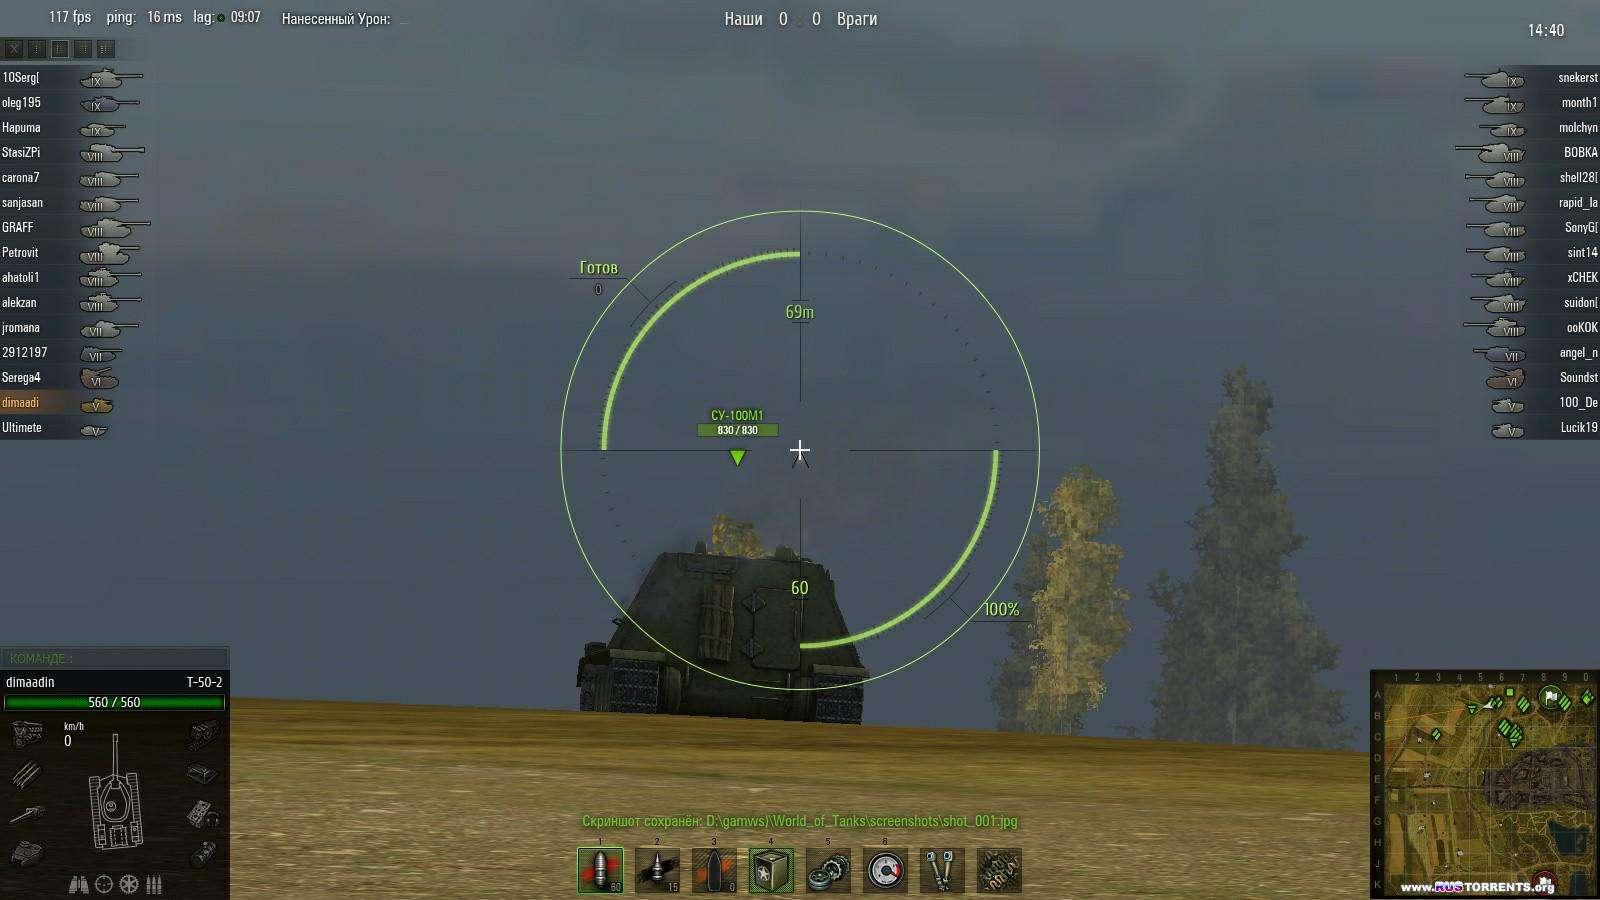 Сборка модов для World Of Tanks от [Патч 0.8.3] от ютуб-канала